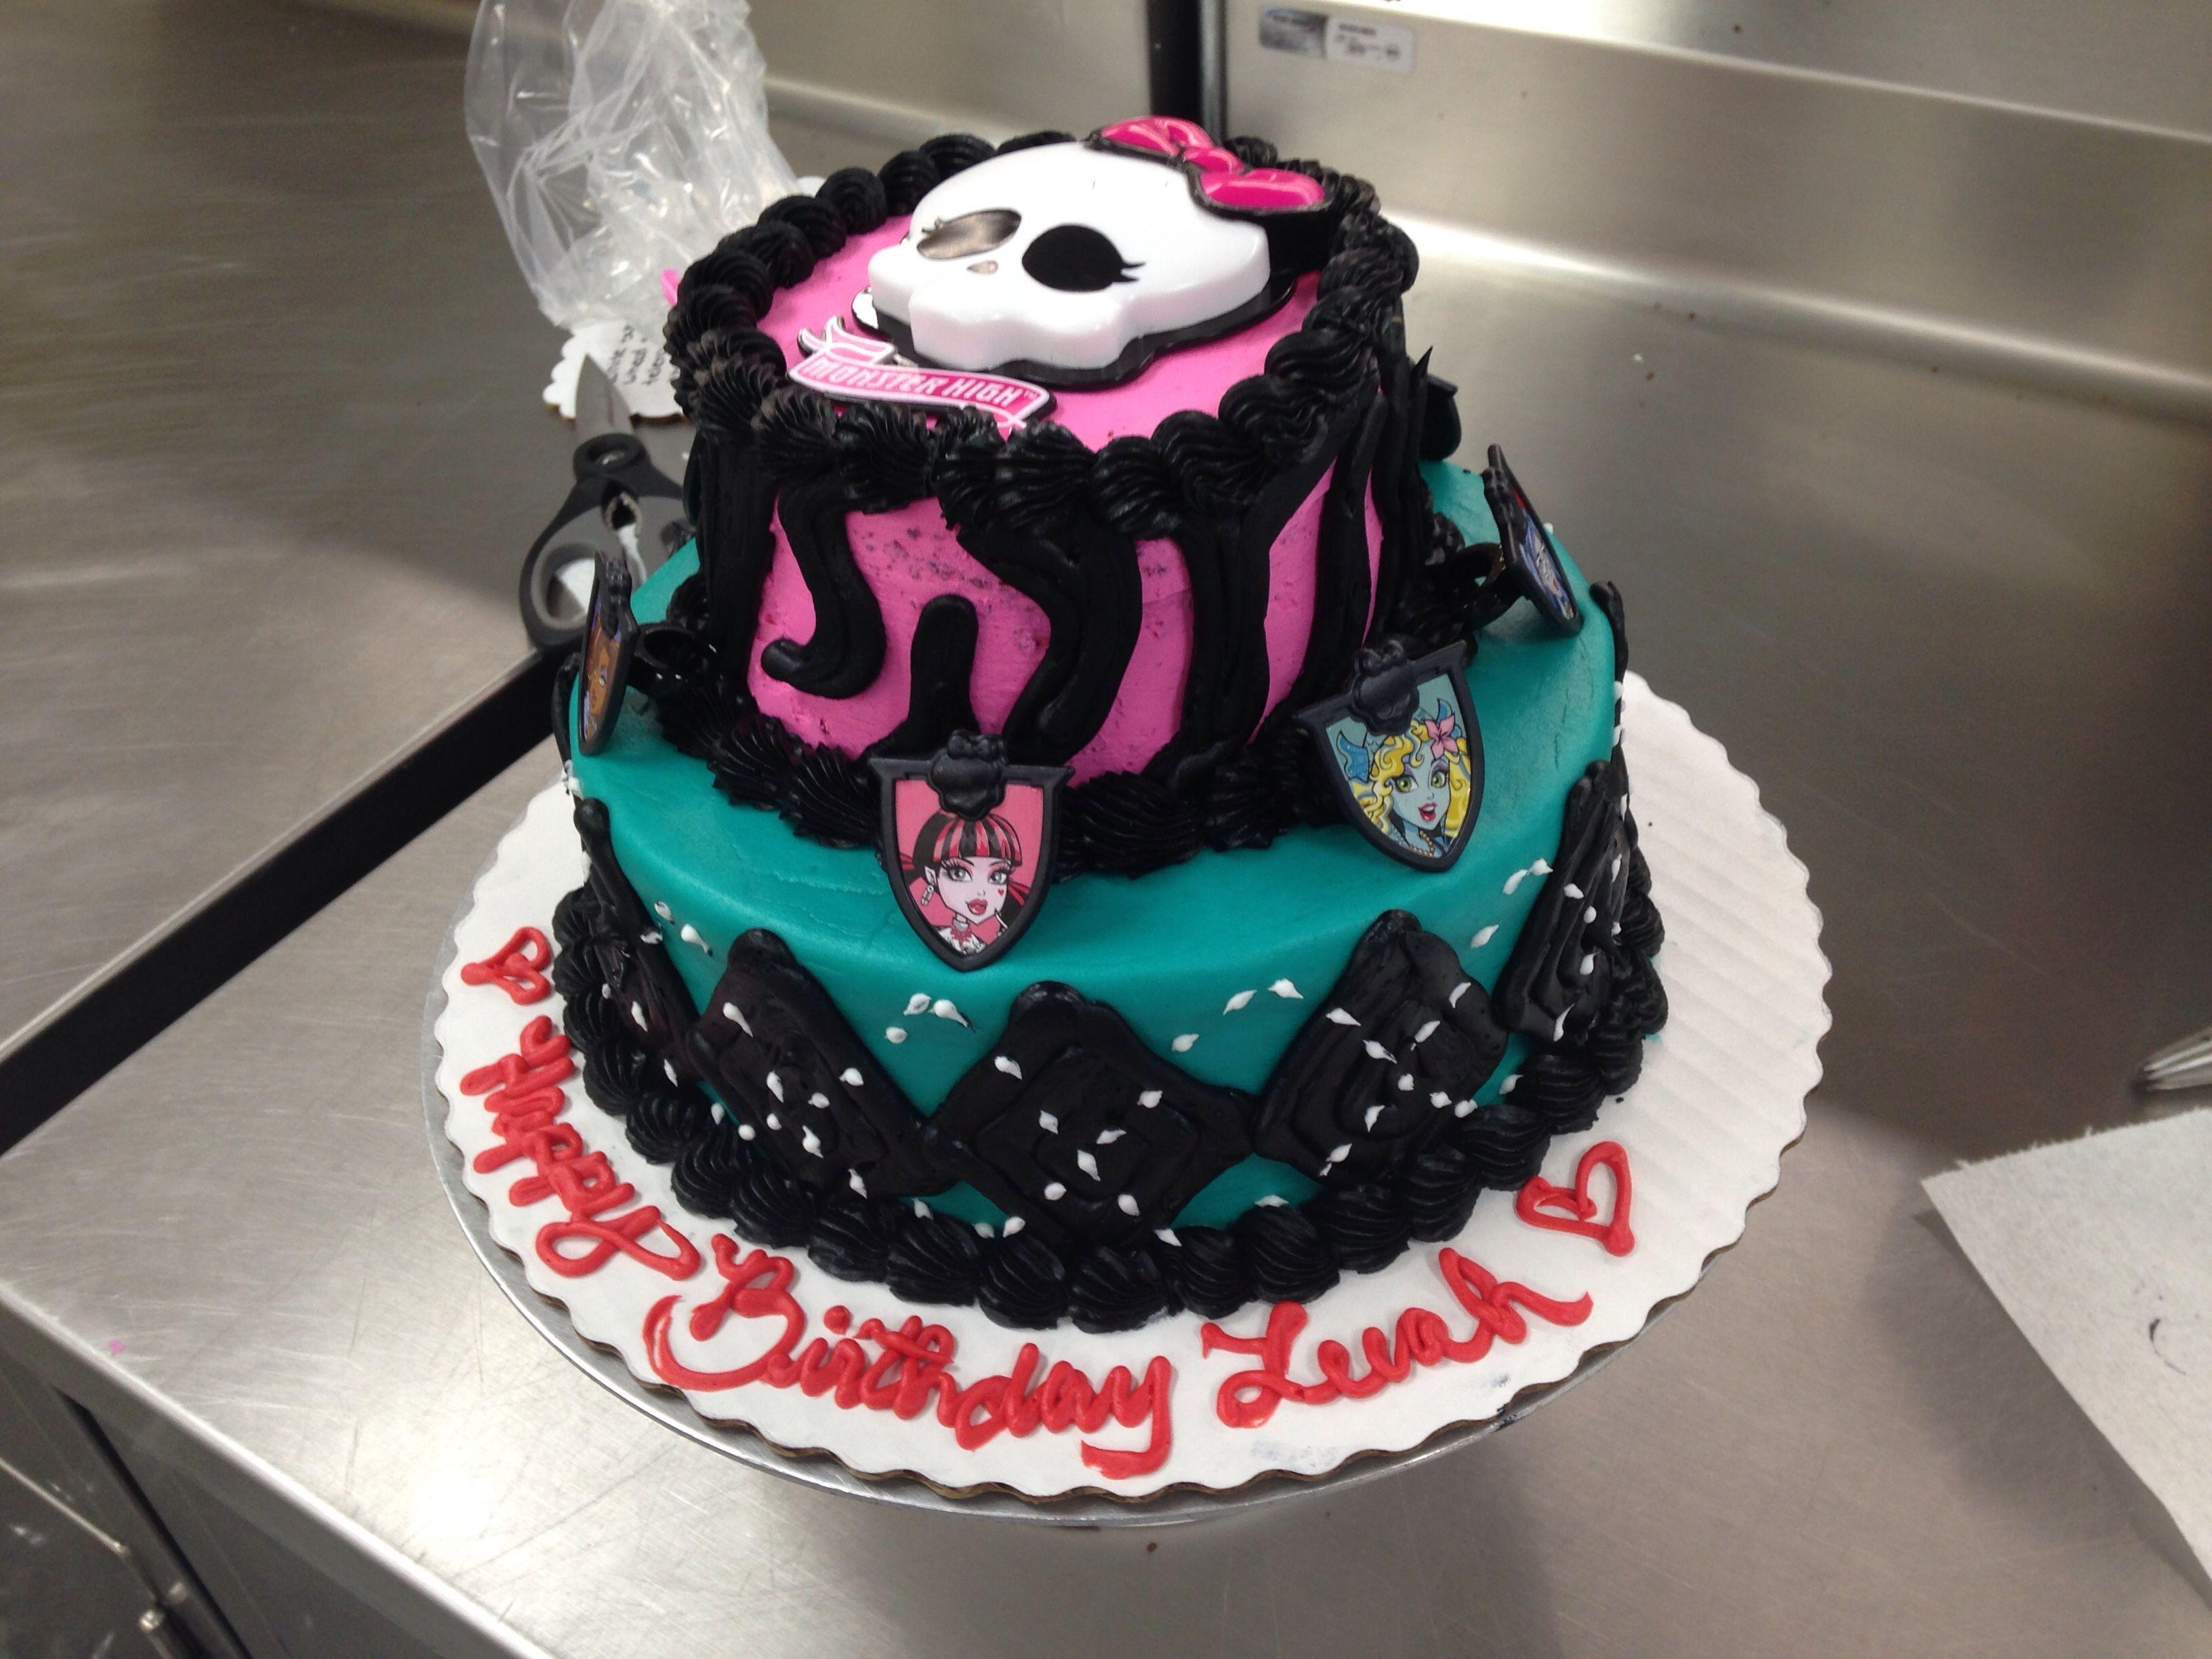 Astonishing Walmart Birthday Cake Fresh Custom Order Monster High Two Tier Personalised Birthday Cards Veneteletsinfo